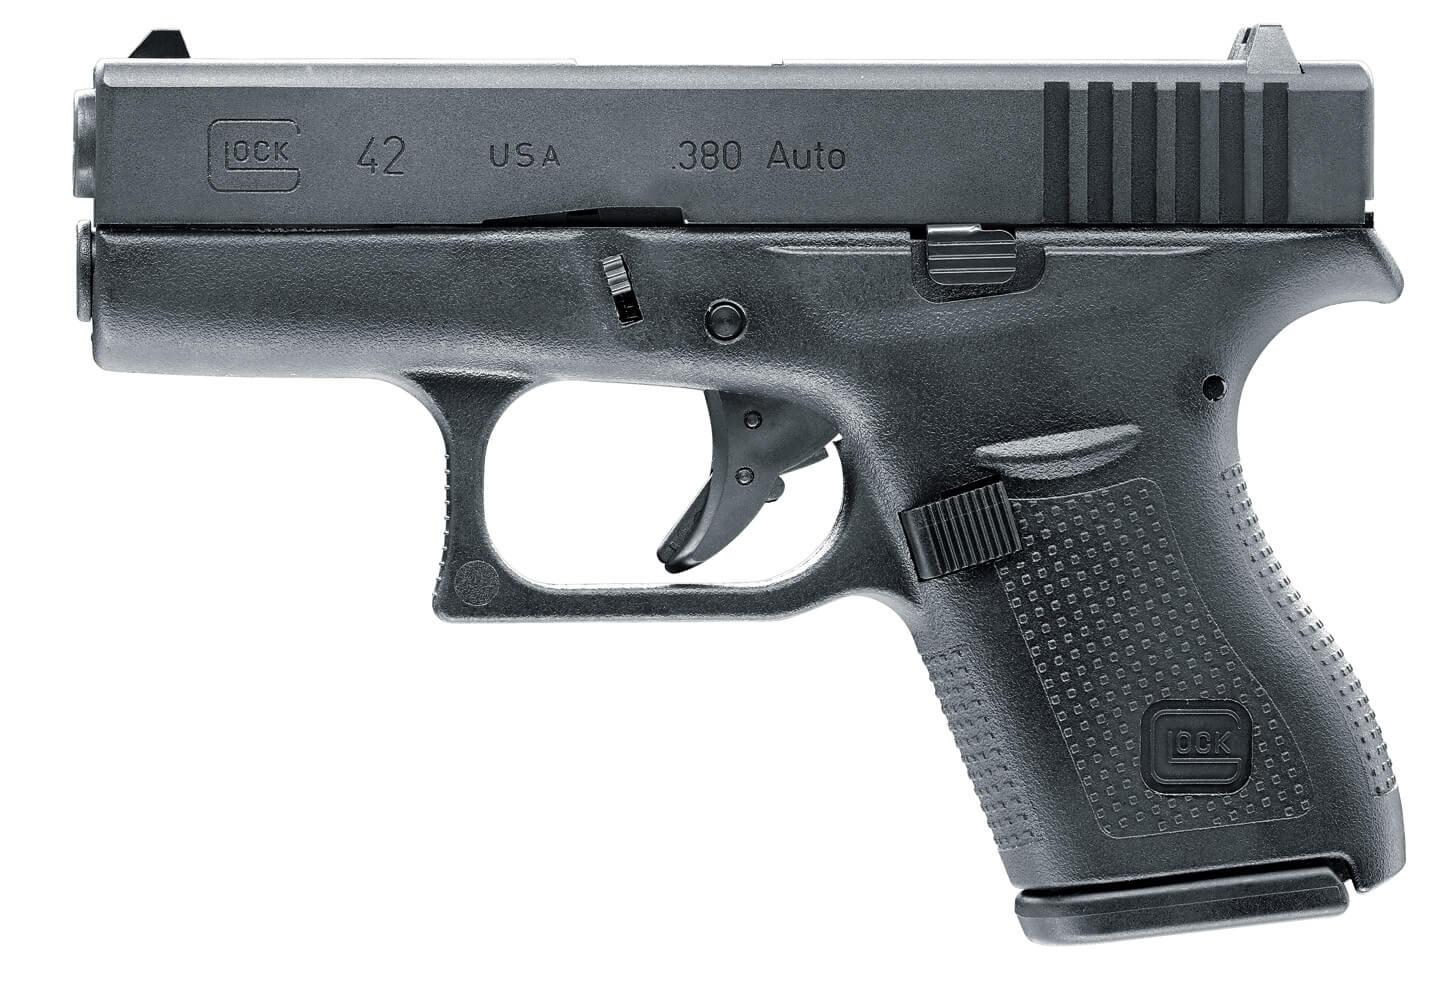 Umarex Glock 42, GBB